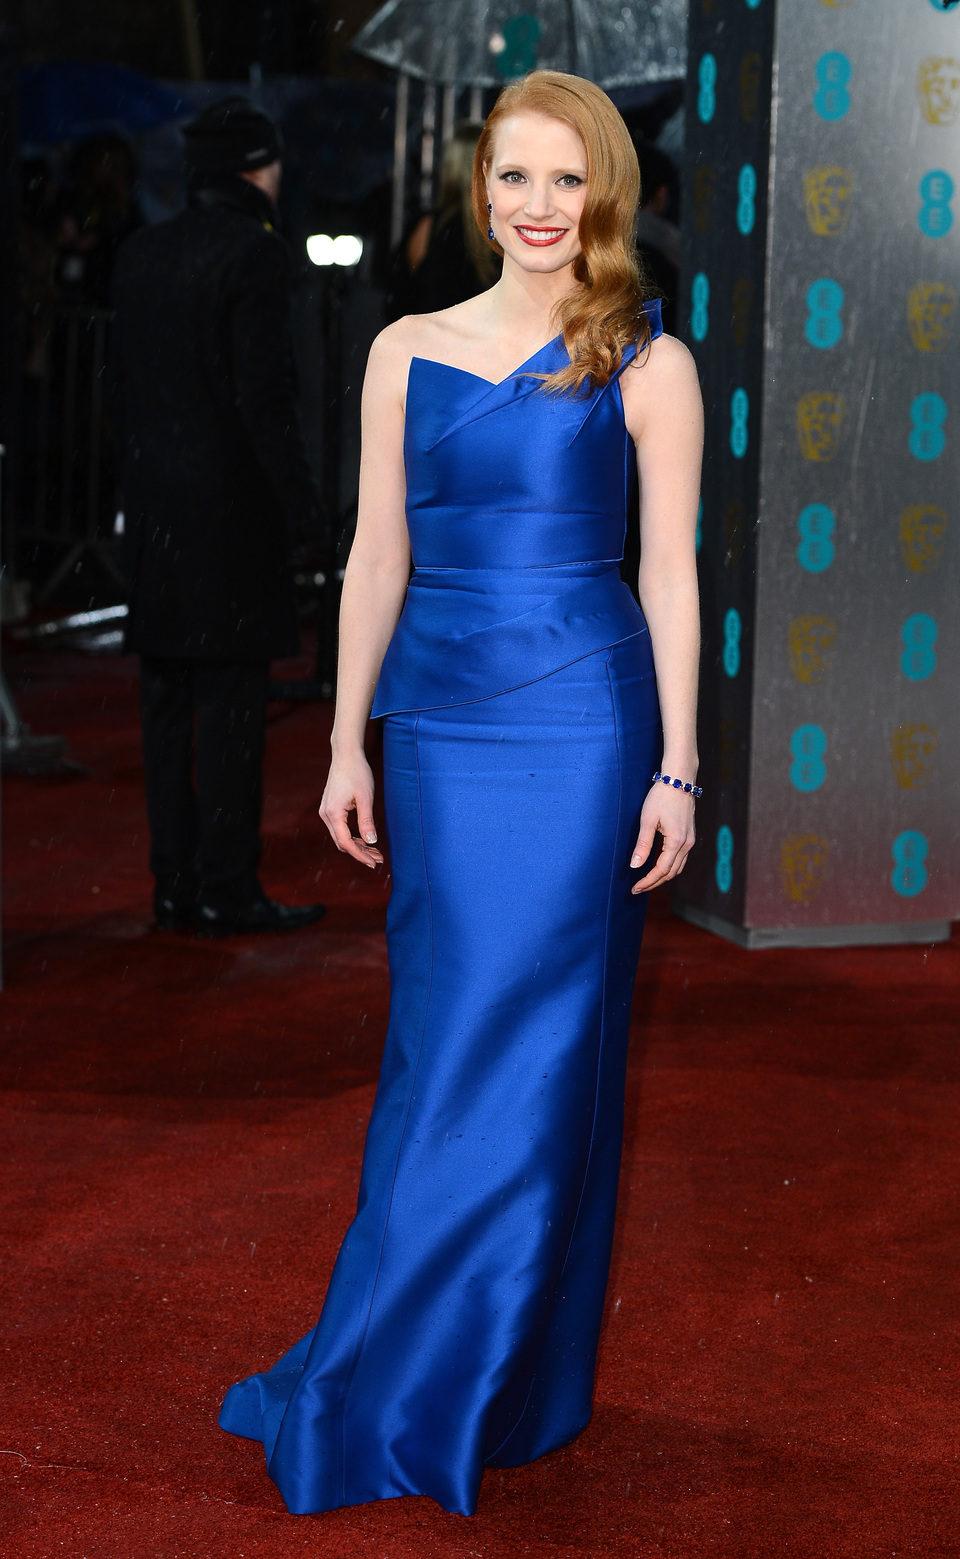 Jessica Chastain en los BAFTA 2013